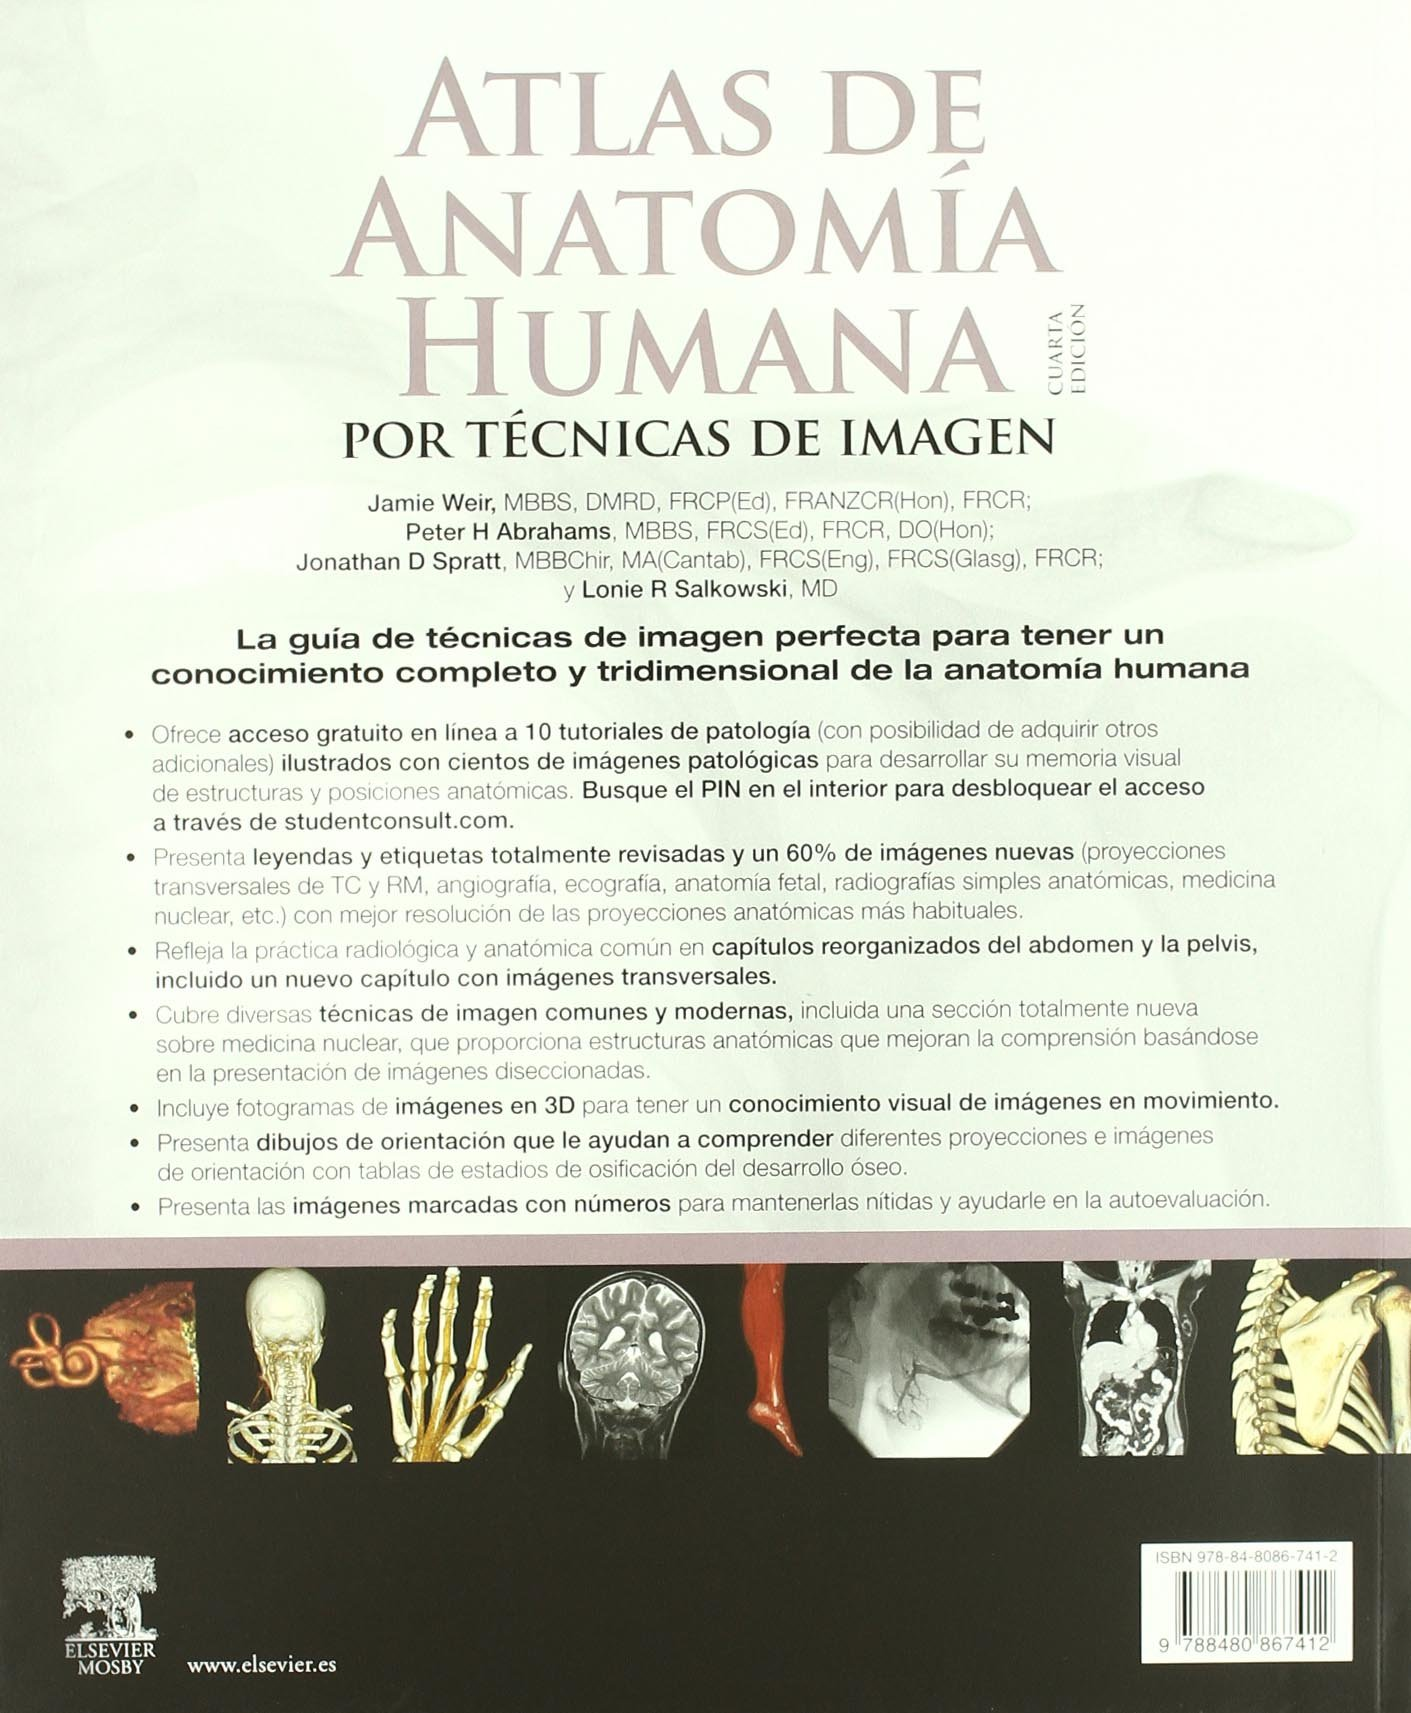 Atlas de Anatomía Humana por técnicas de imagen: Amazon.es: J. Weir ...